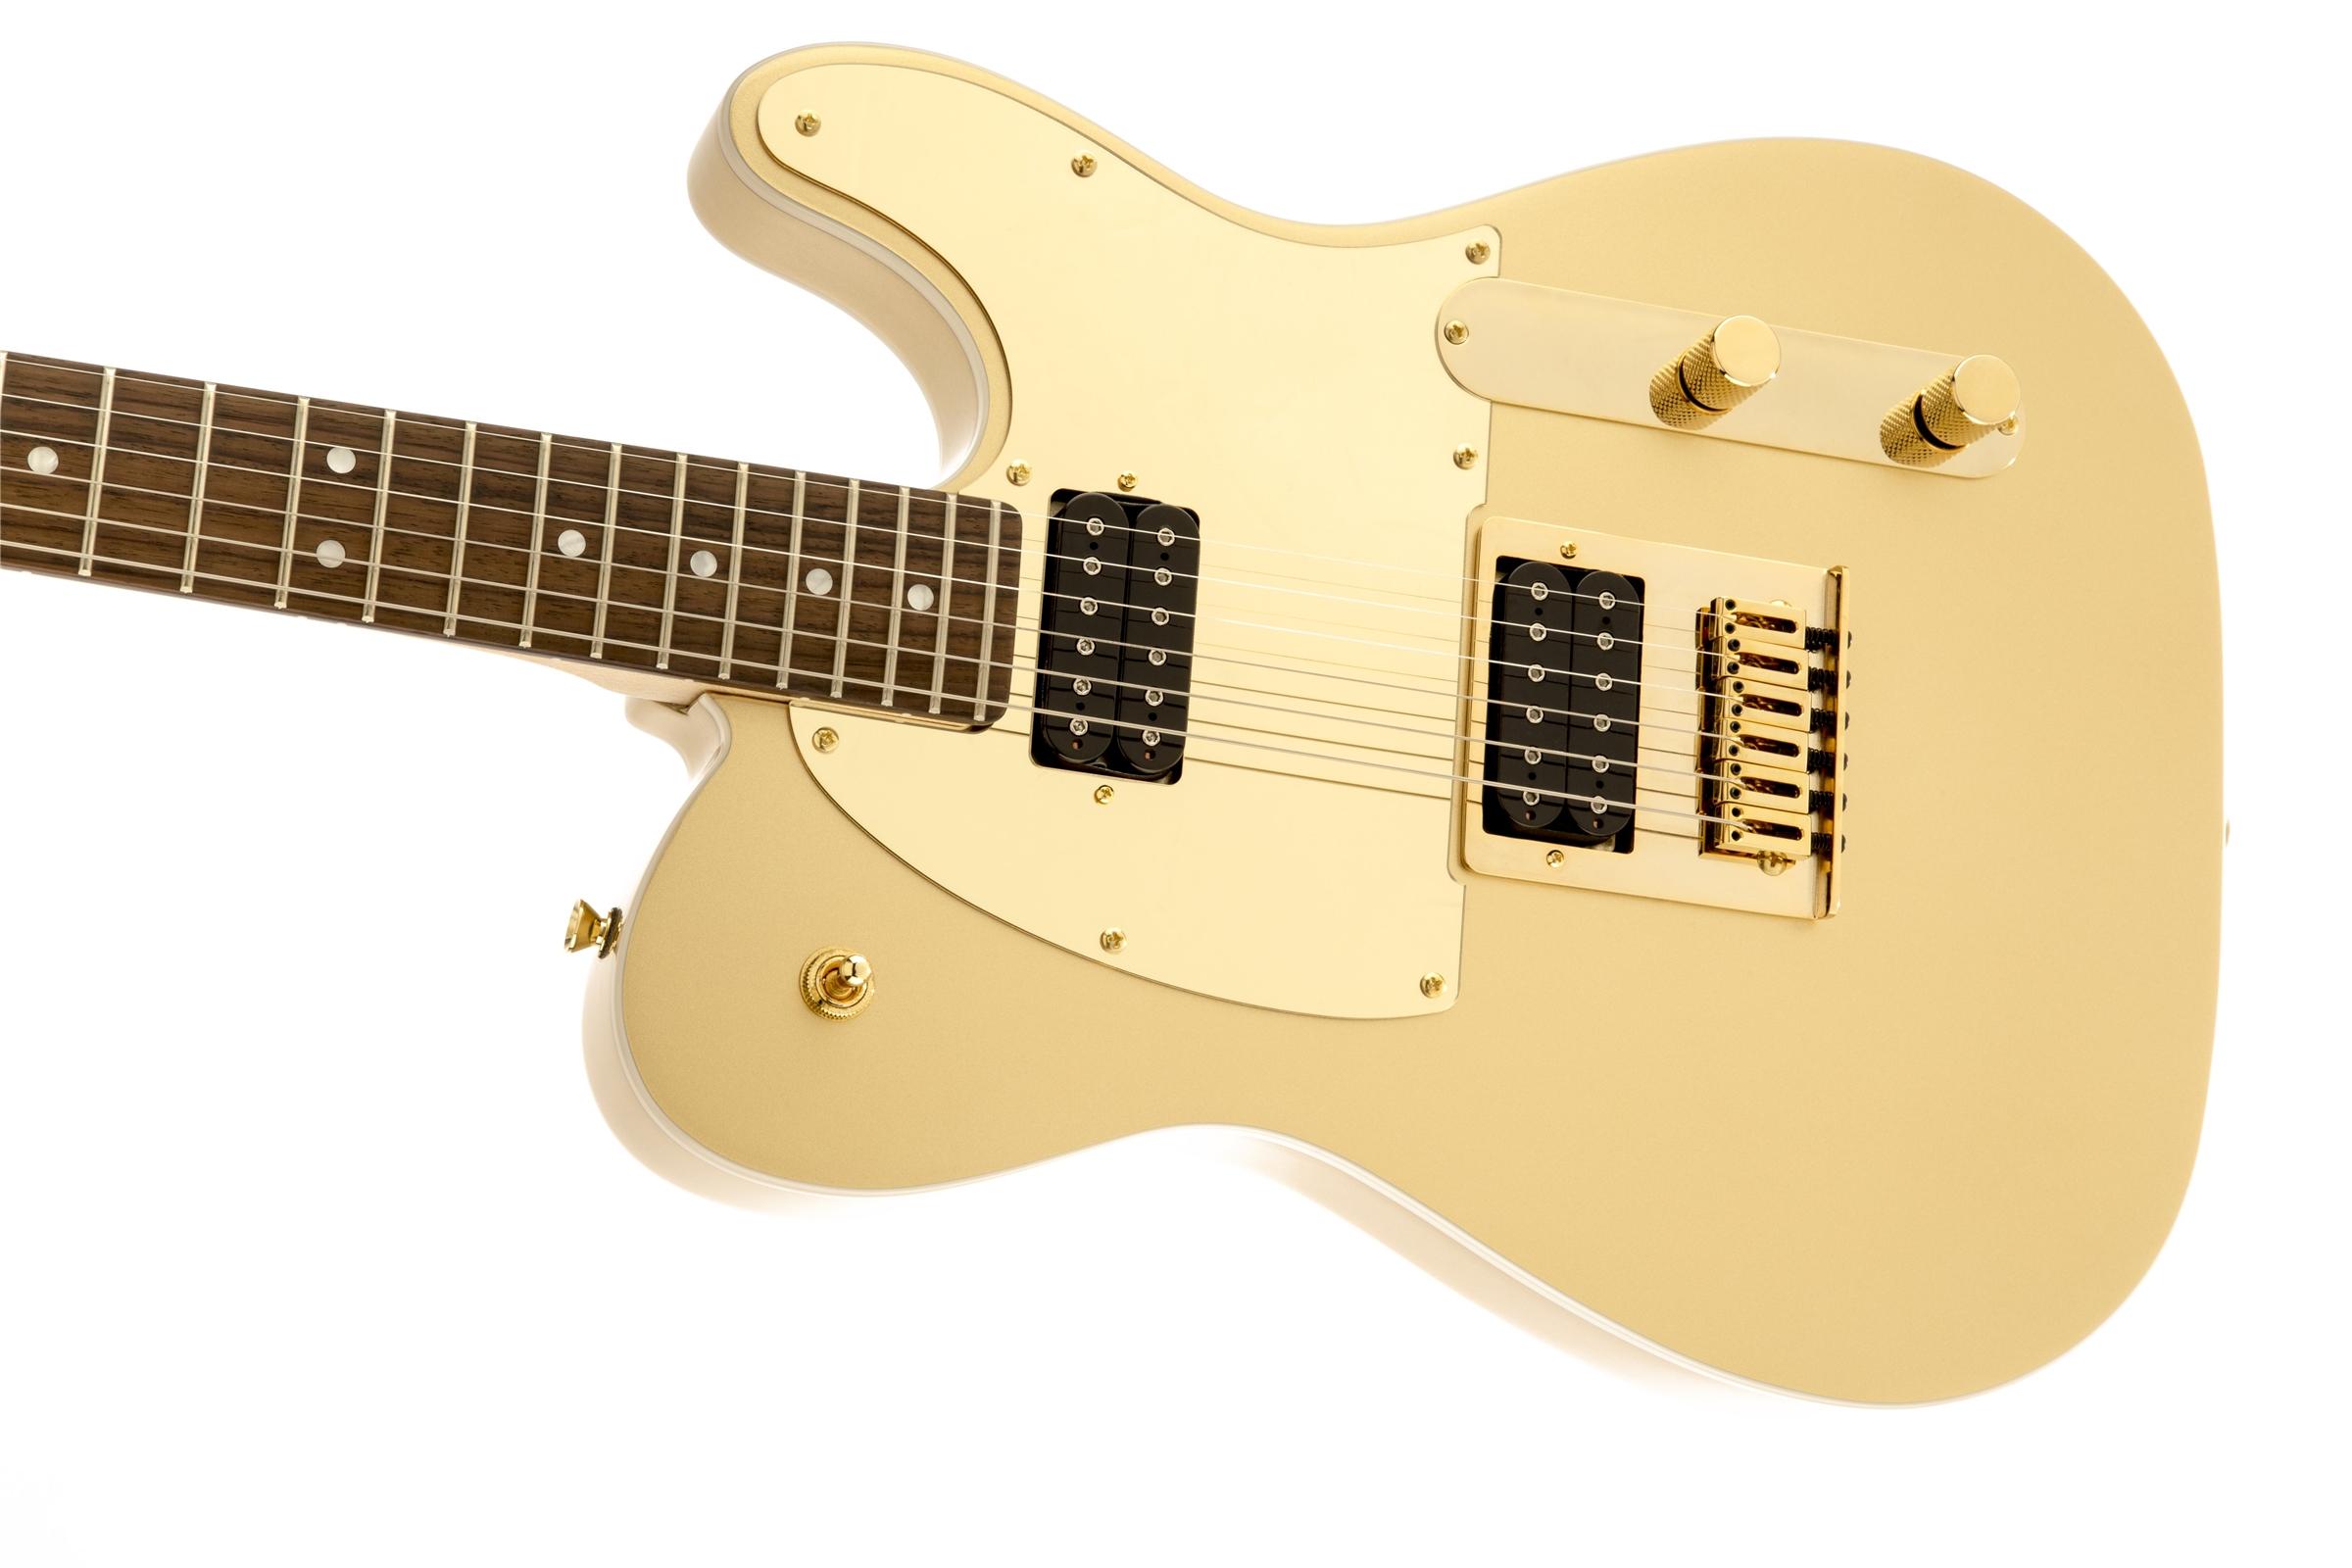 j5 telecaster squier electric guitars. Black Bedroom Furniture Sets. Home Design Ideas